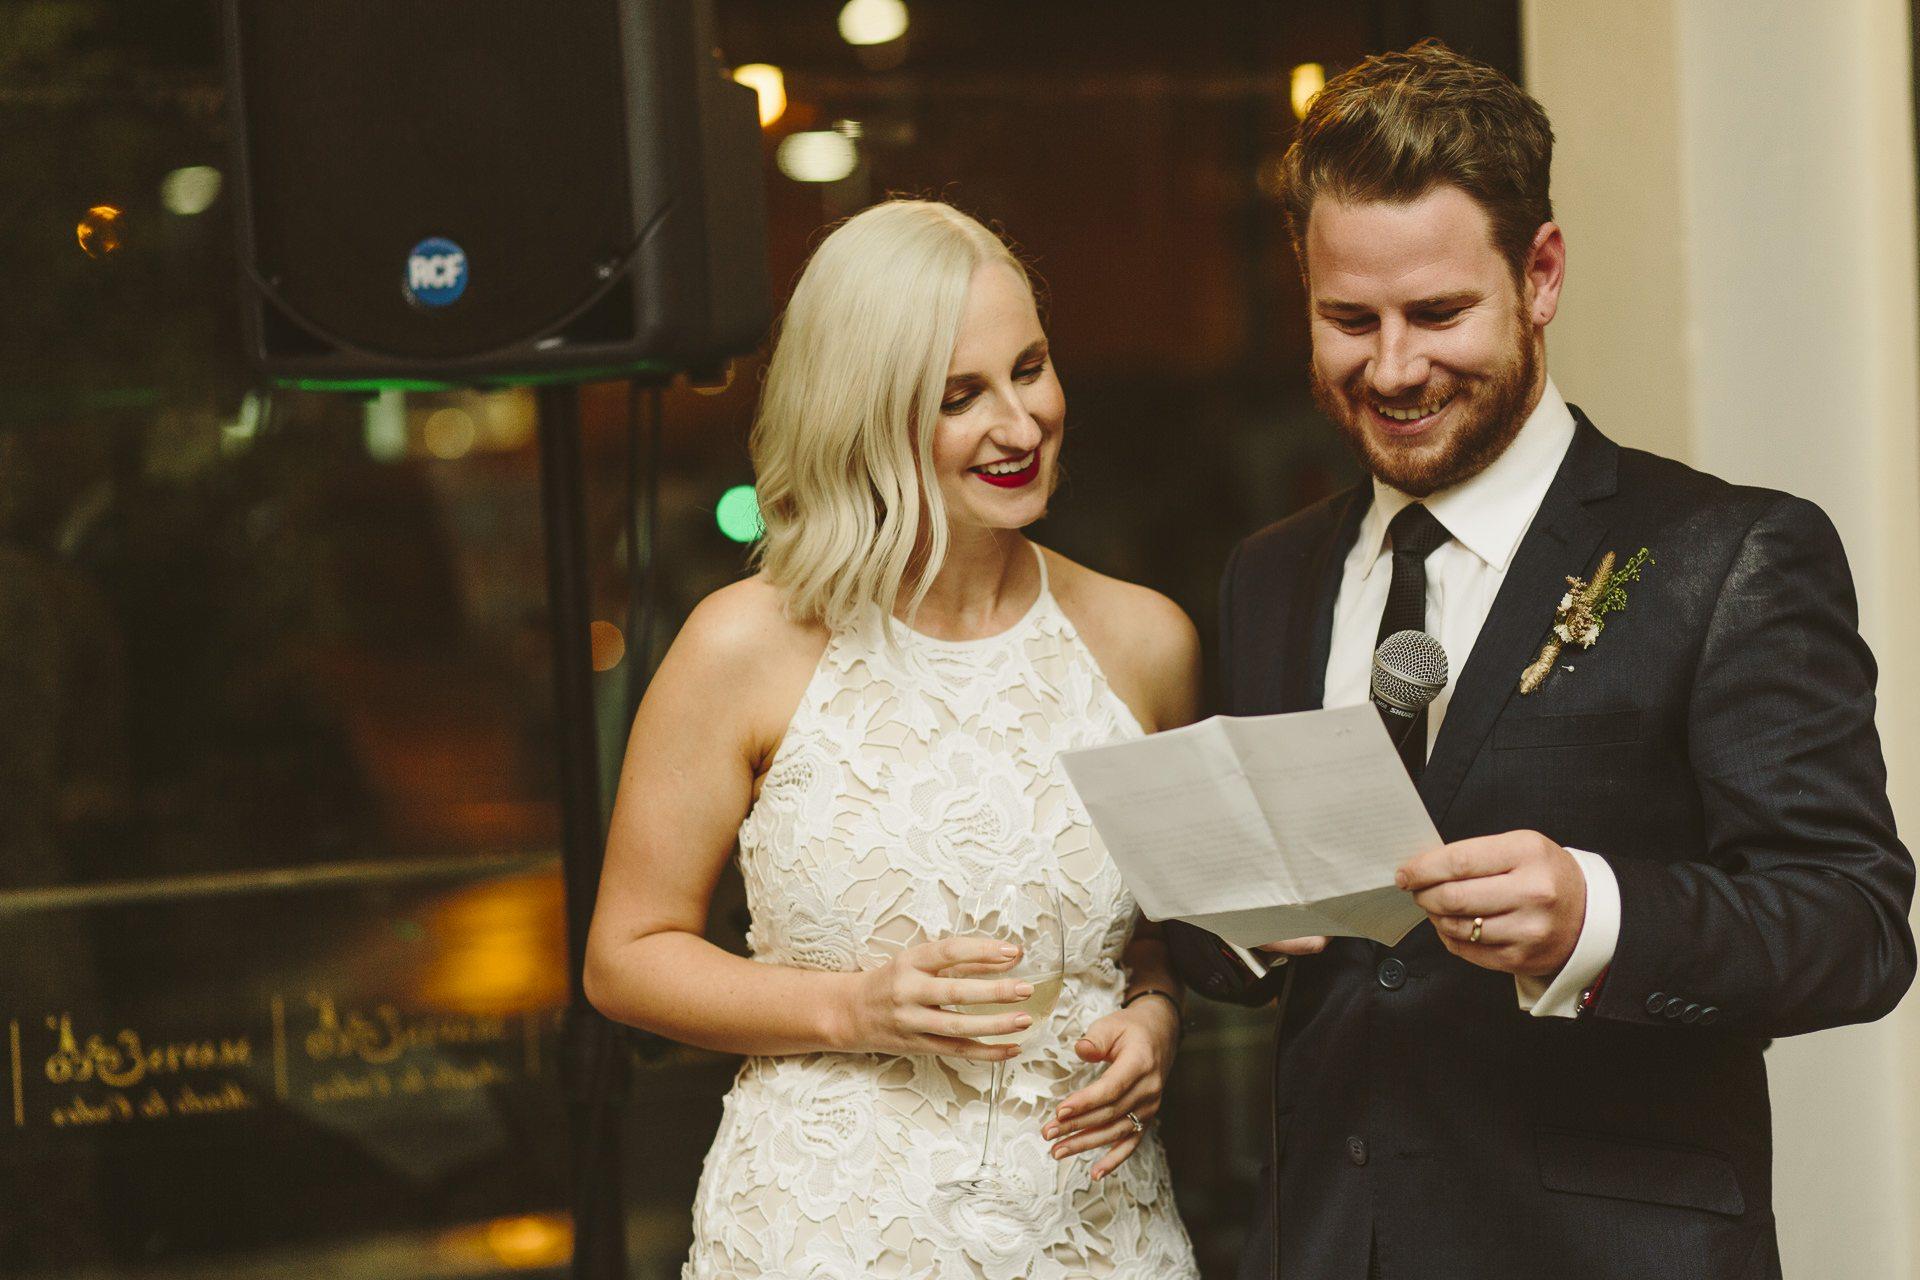 hamilton-wedding-portrait-photographer-at-261